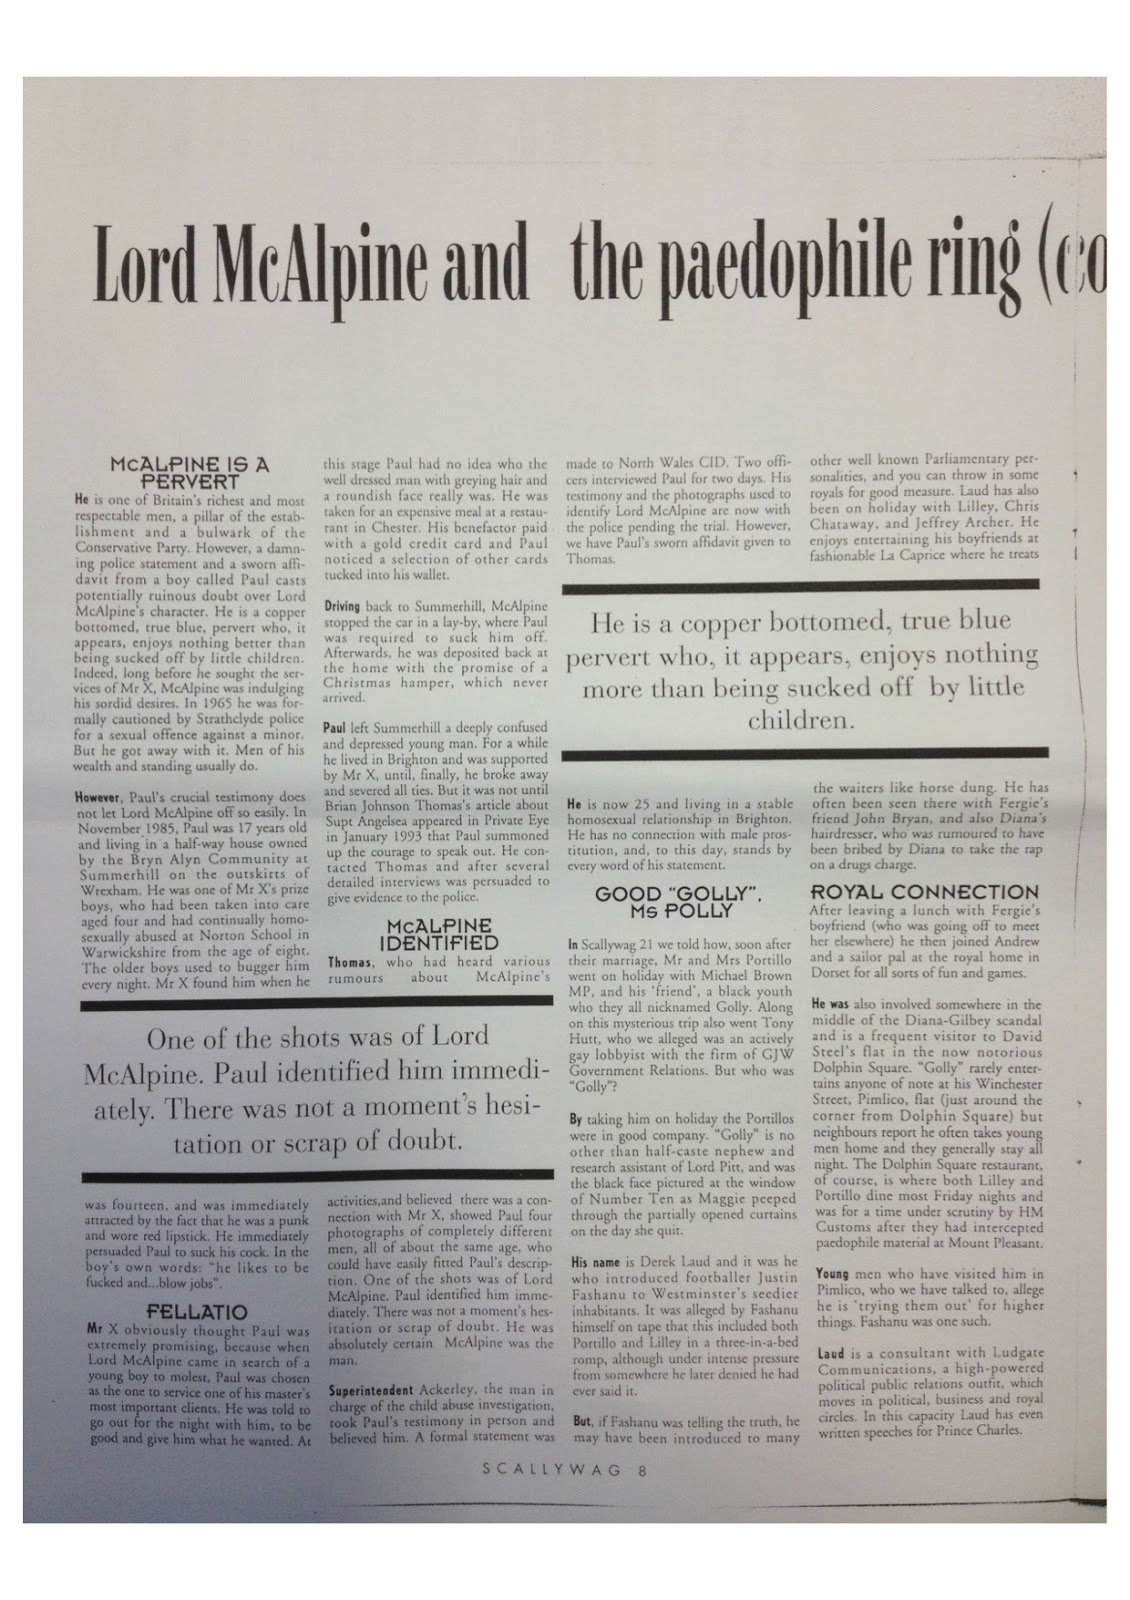 mcalpine_3.jpg